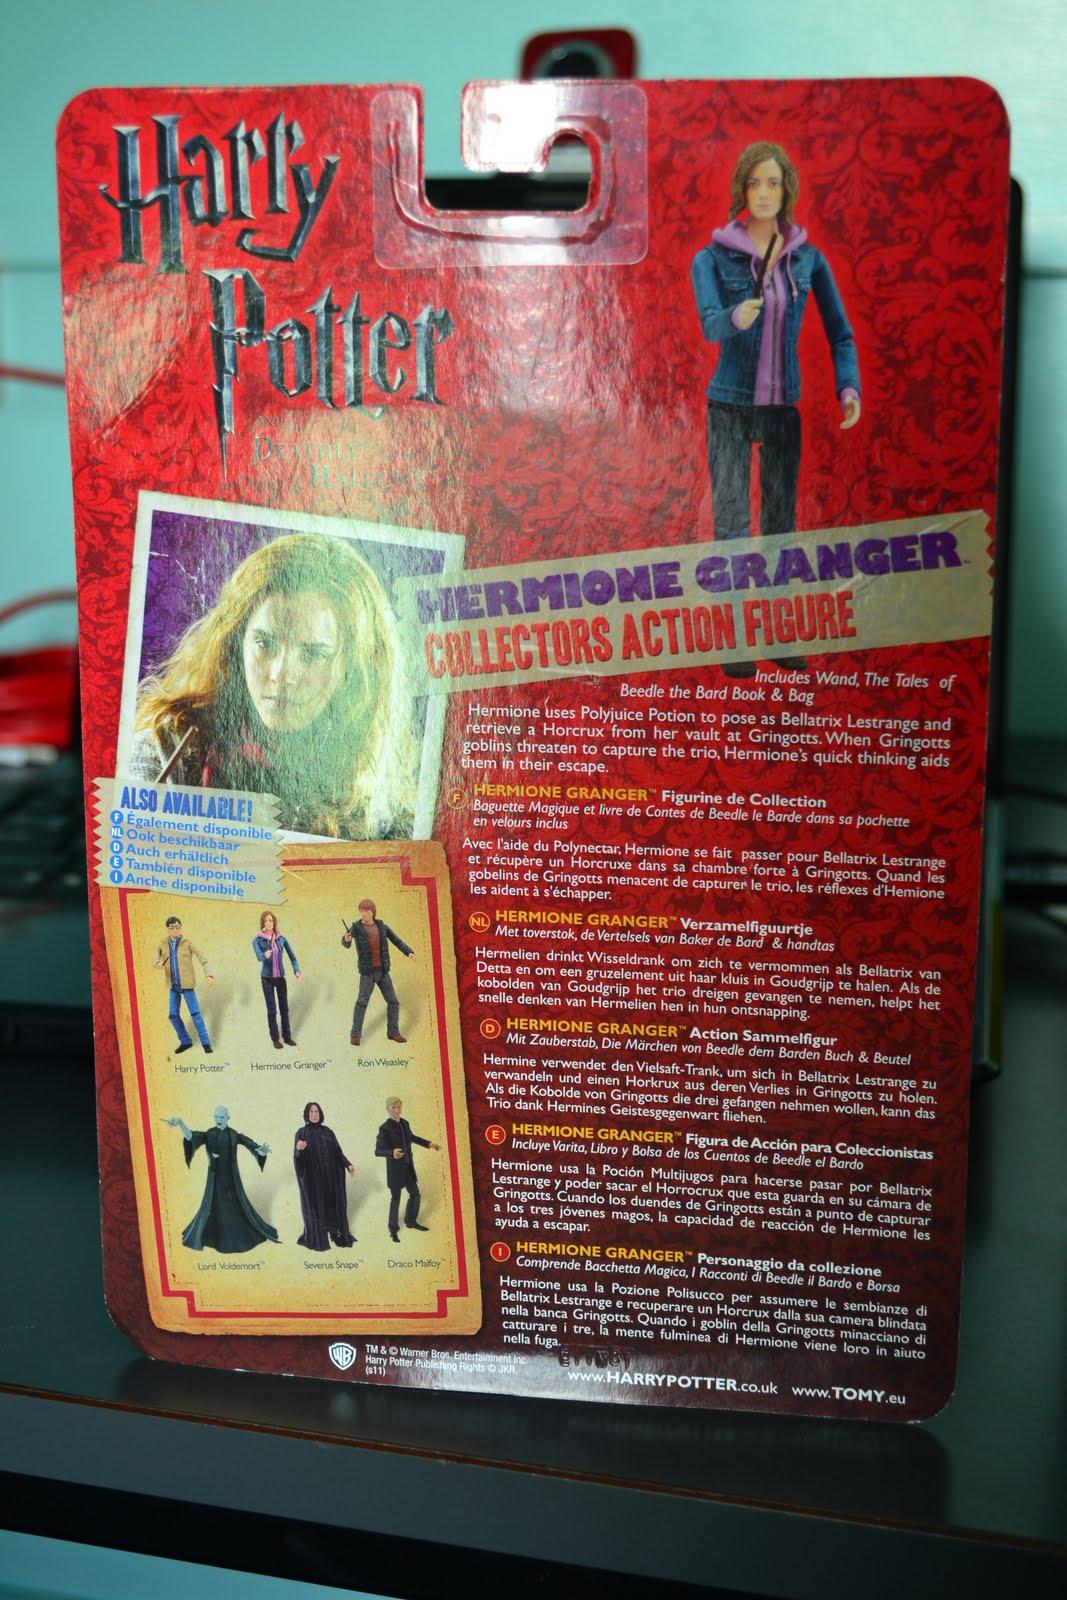 bellatrix lestrange and hermione granger